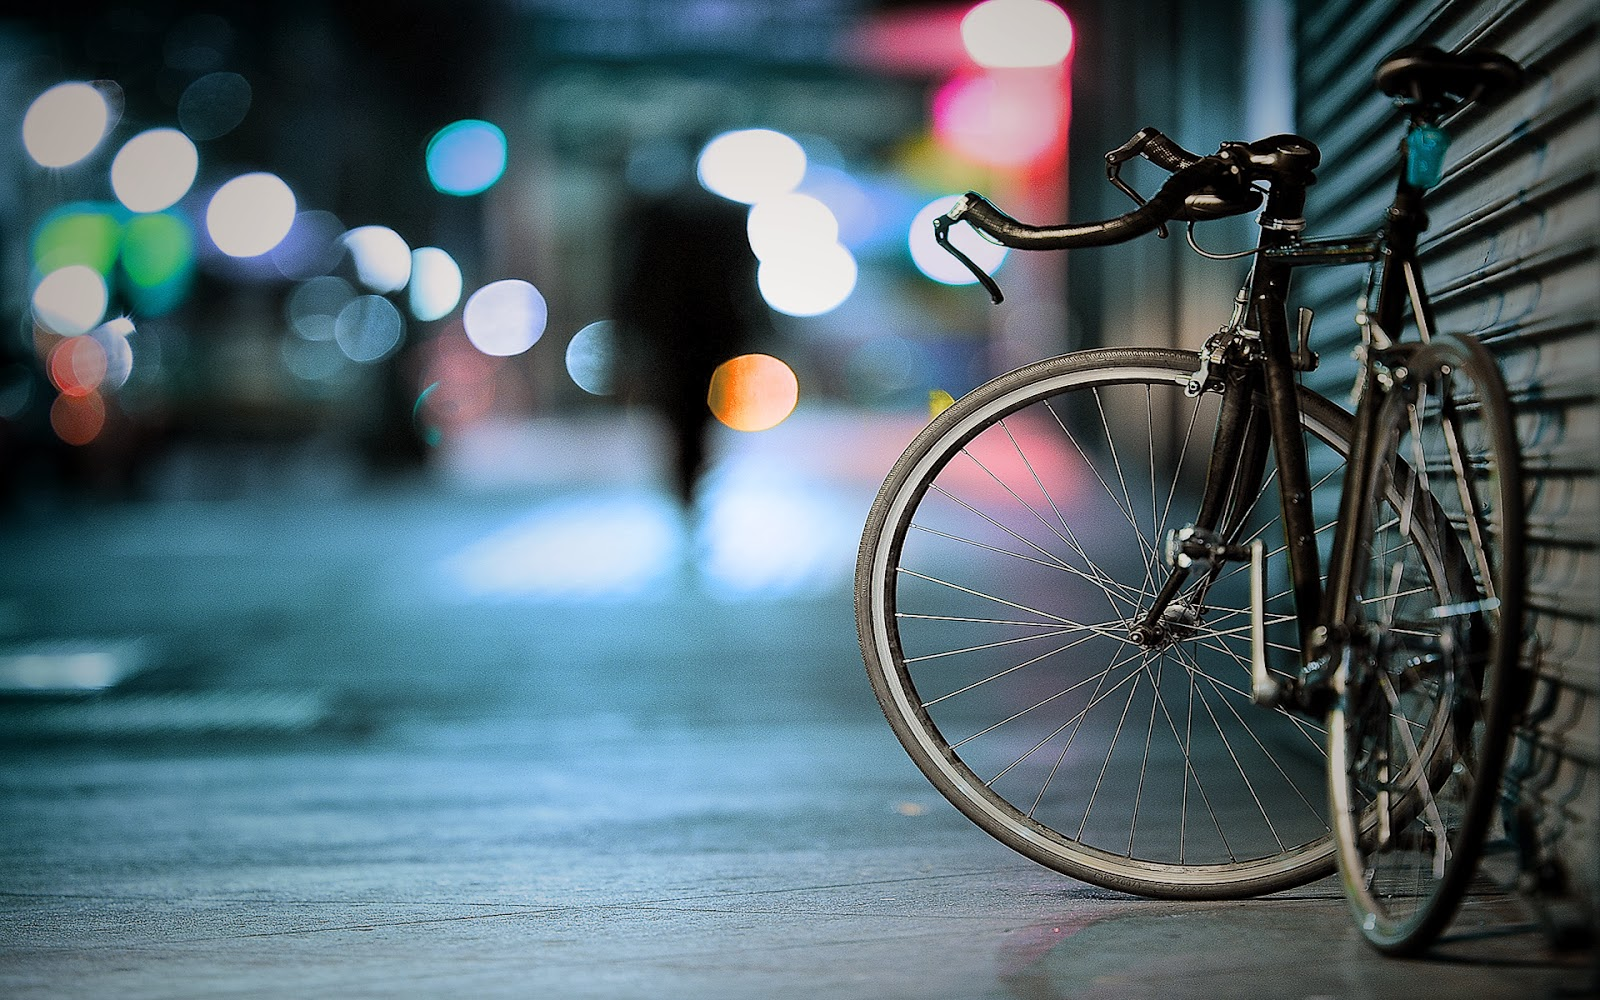 "<img src=""http://4.bp.blogspot.com/-UGoig2RXuZY/UufTEo6PpZI/AAAAAAAAKhw/65s2LoXv_m4/s1600/bicycle-wallpaper.jpg"" alt=""bicycle wallpaper"" />"